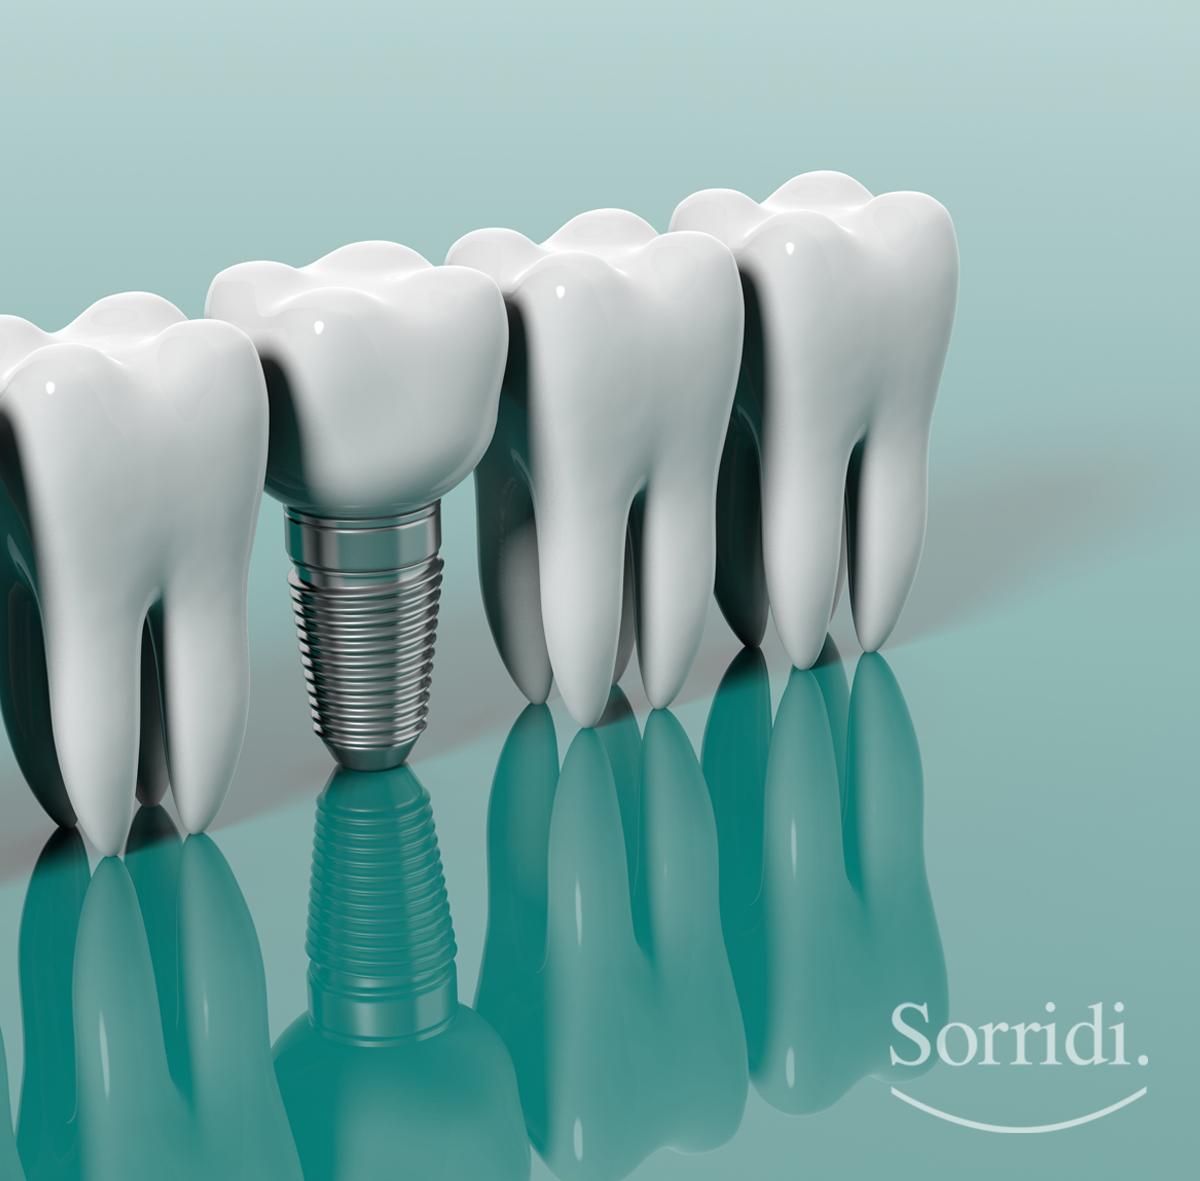 sorridi-ch-magazine-impianti-dentali